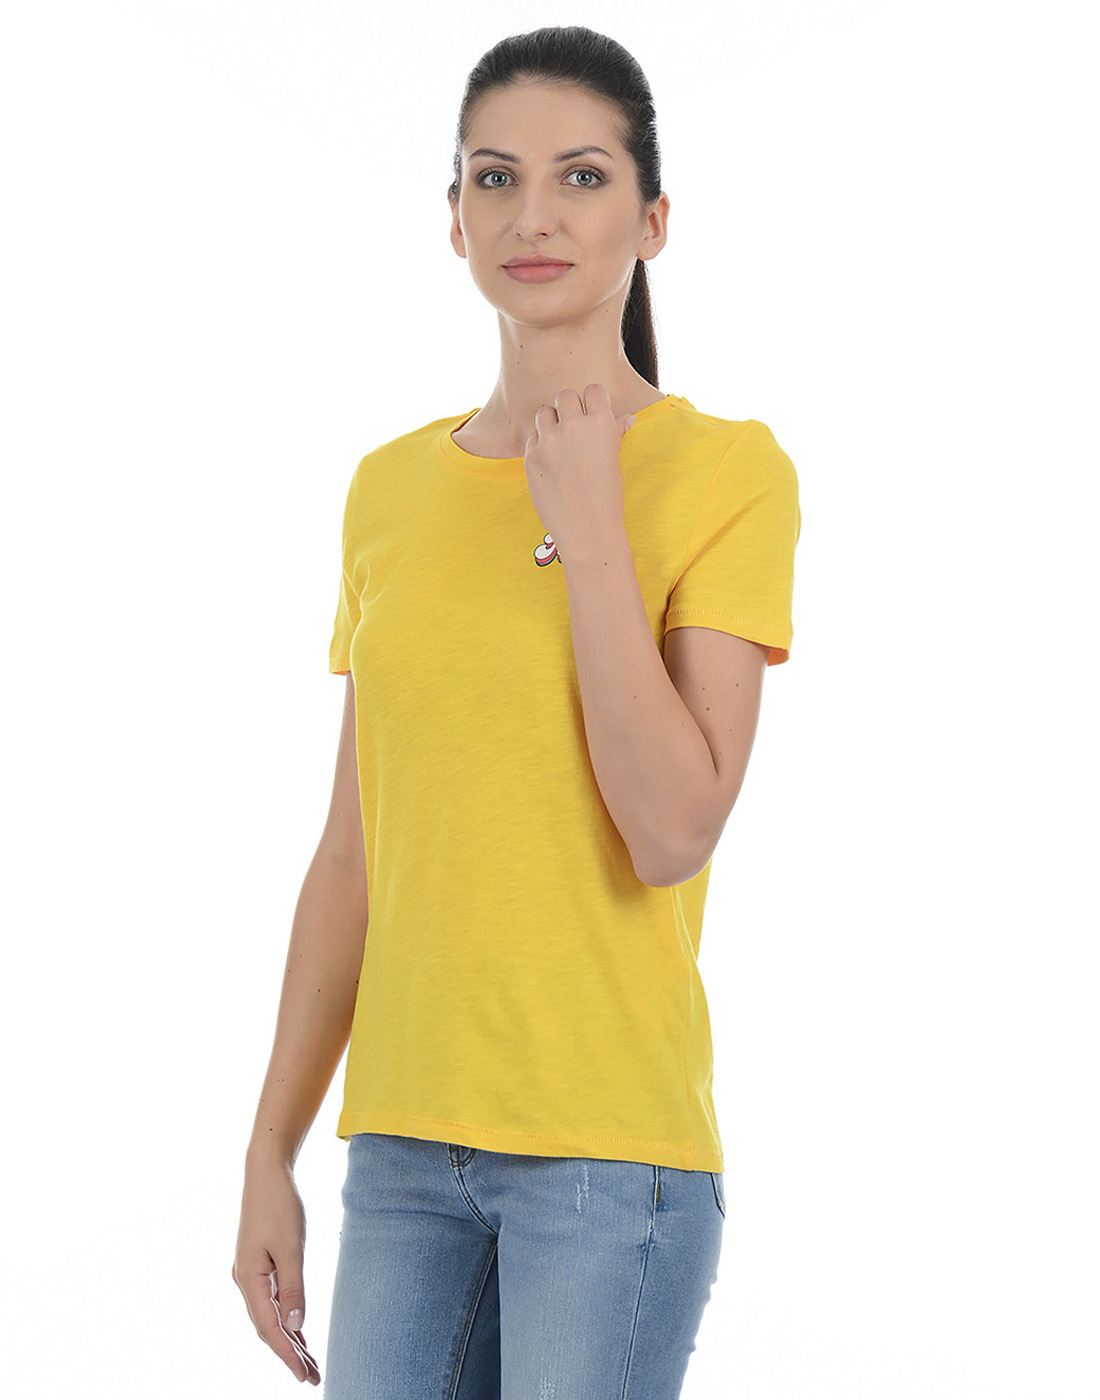 Only Women Casual Yellow T-Shirt